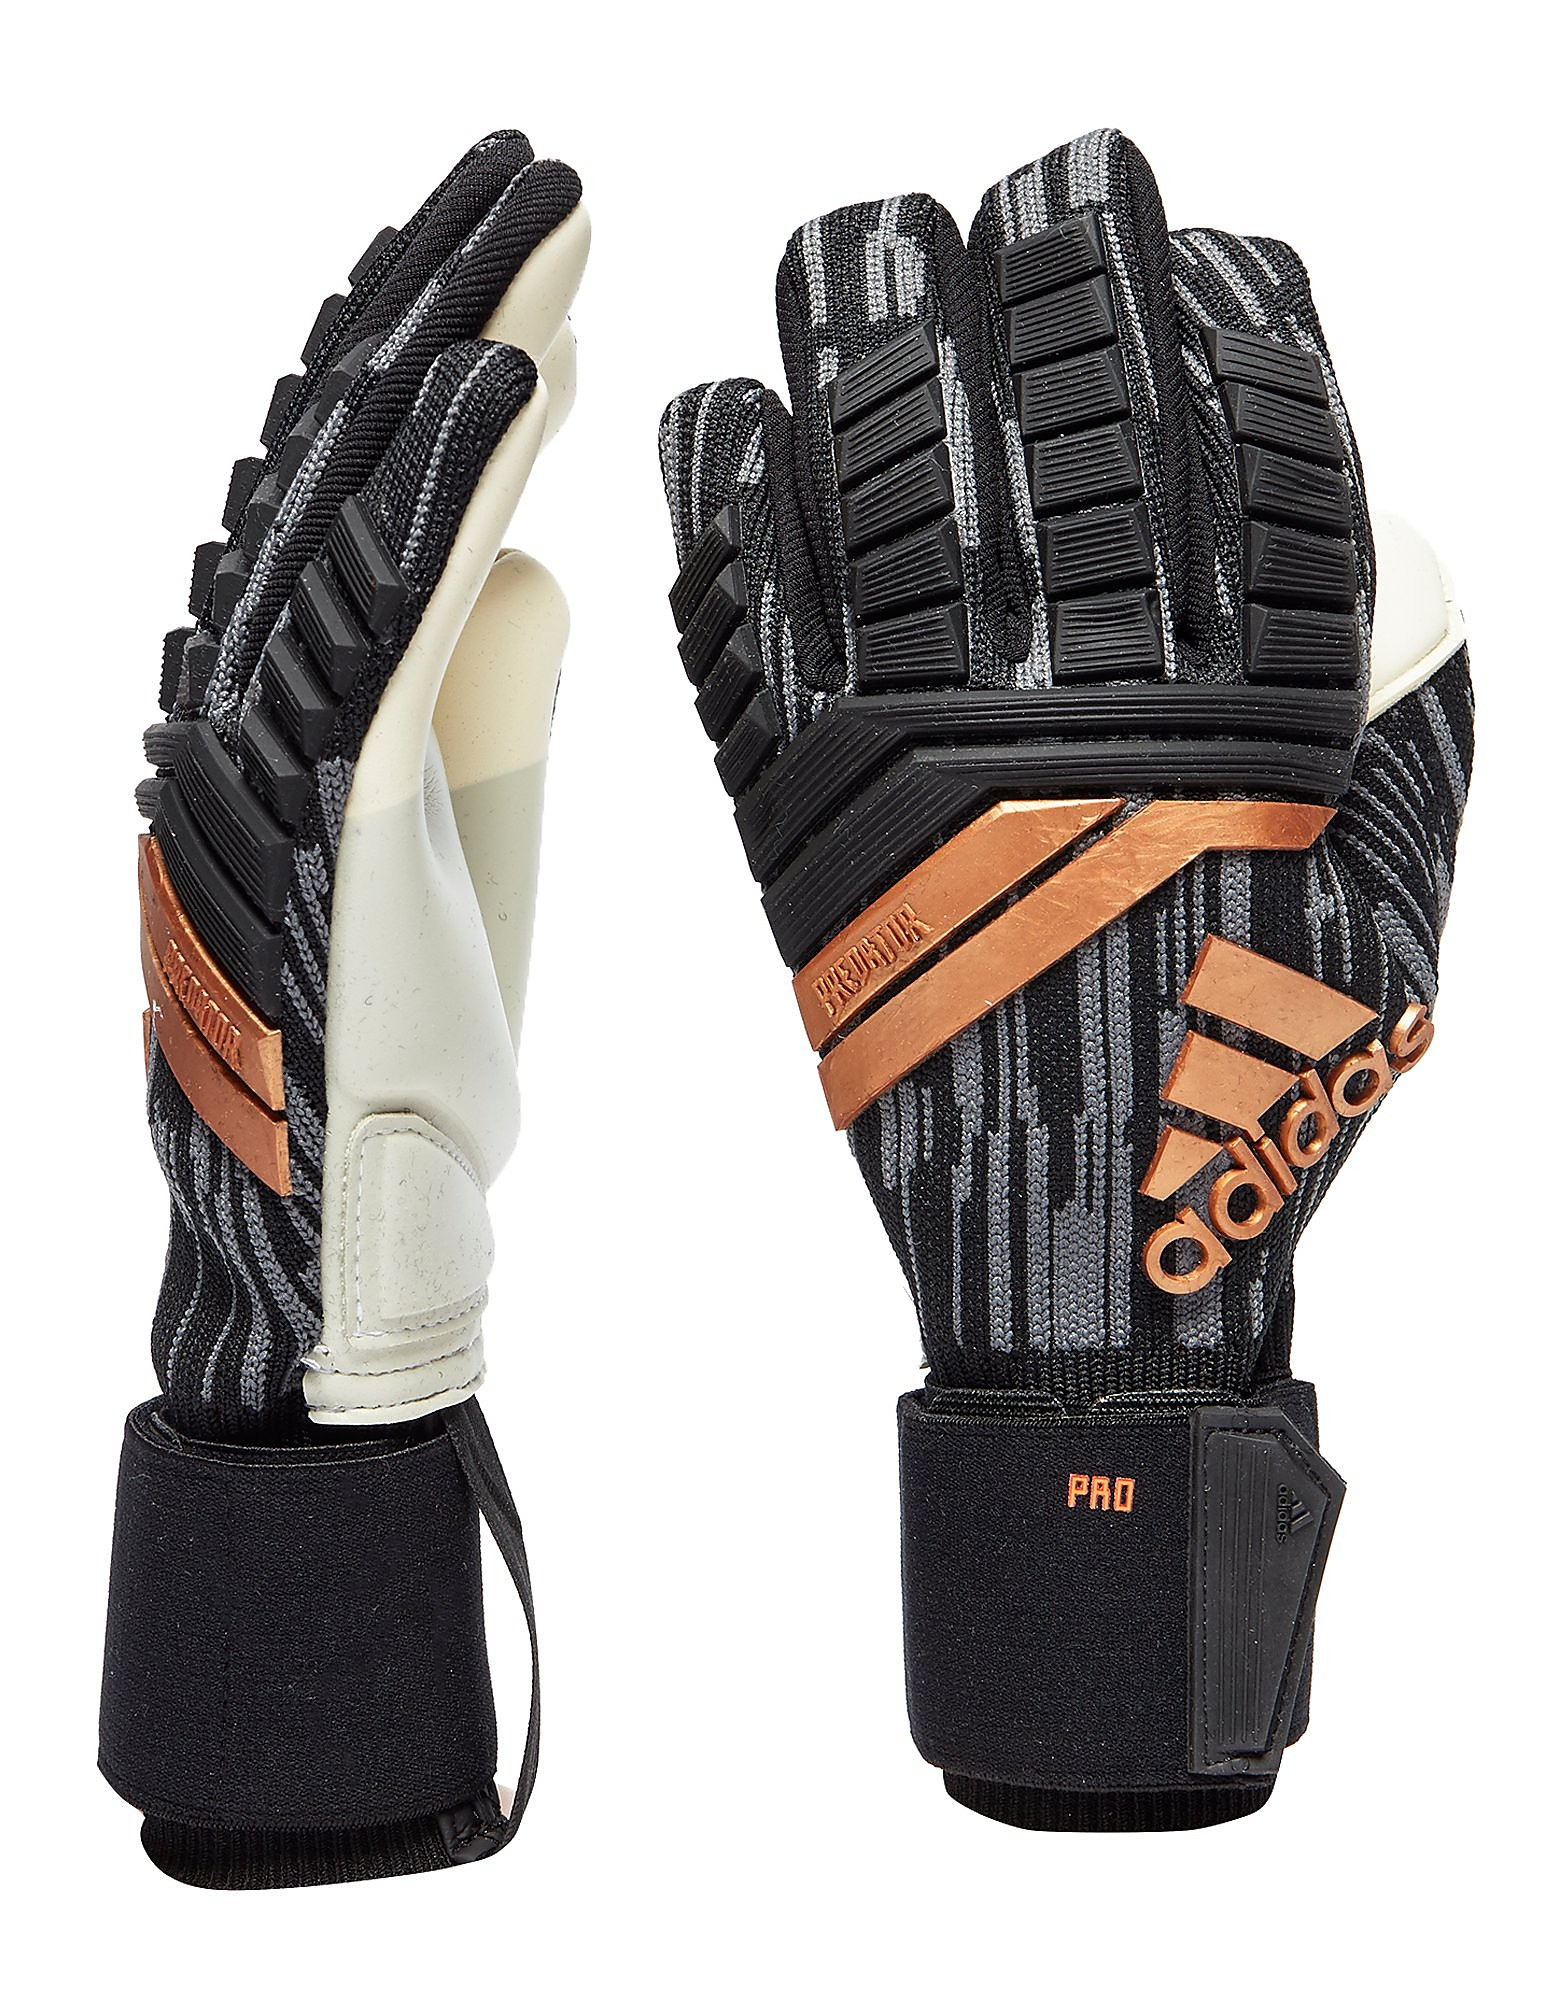 adidas Predator 18 Pro Goalkeeper Gloves